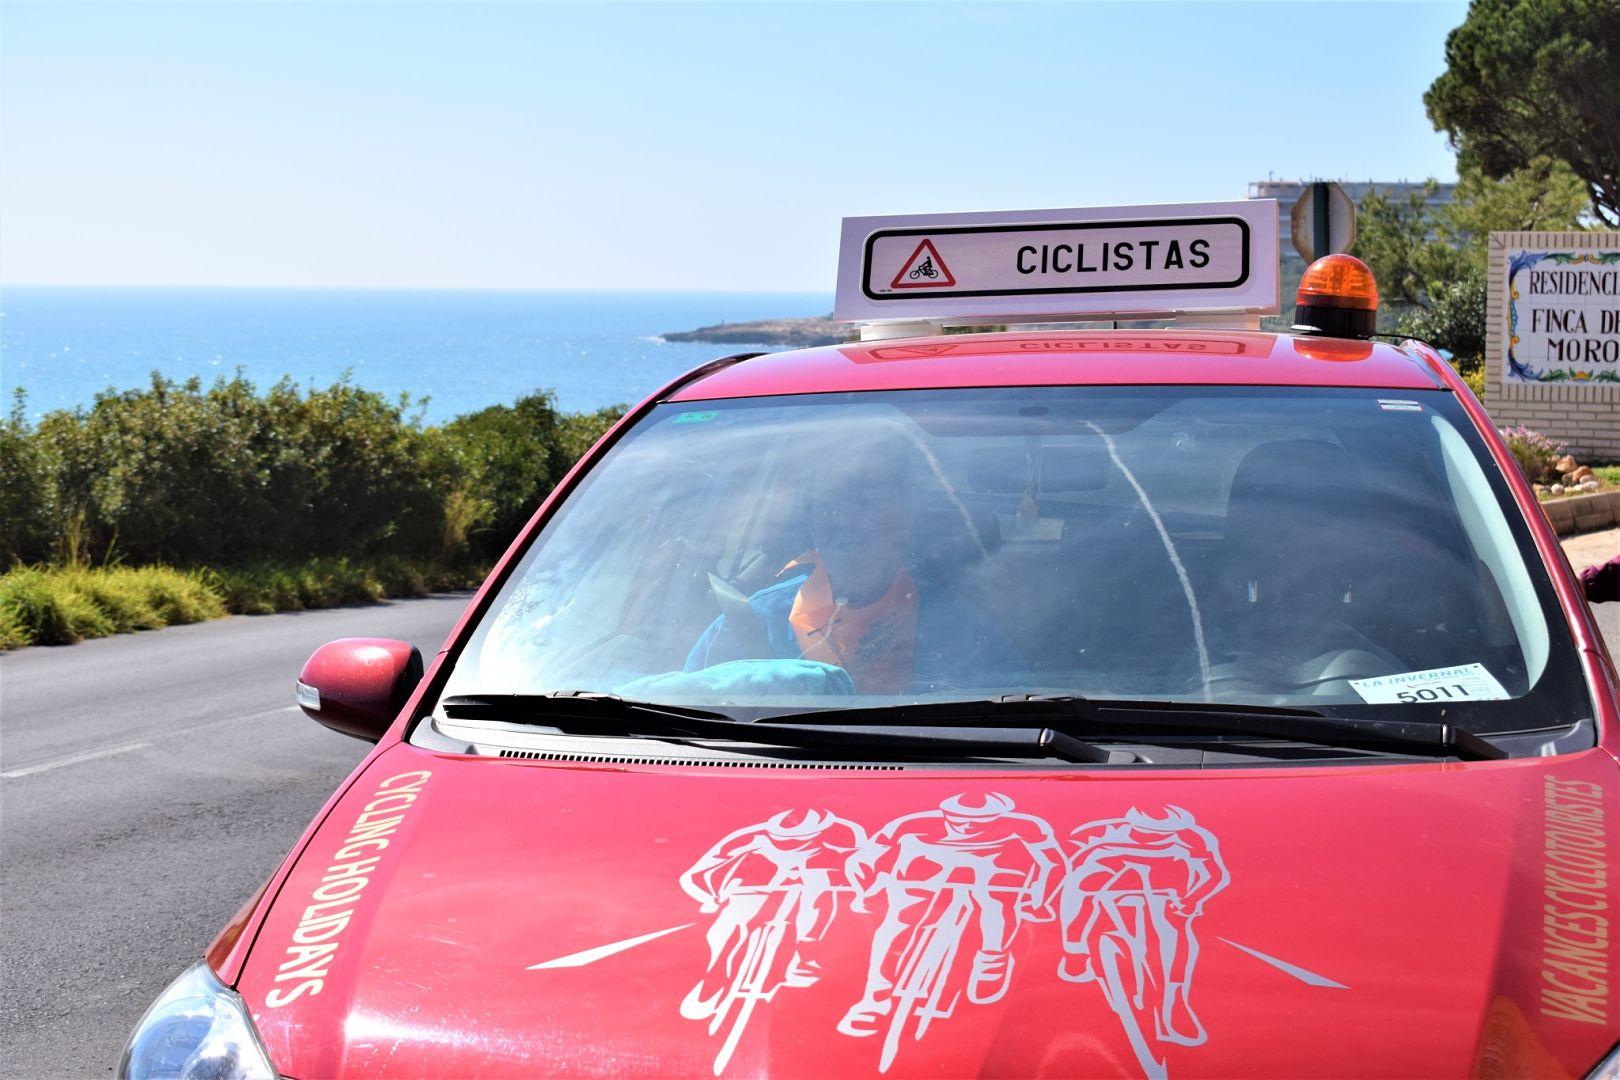 SLIDER_viajes_bici_maestrat_stage_peñiscola_CICLISMO_CARRETERA_coche